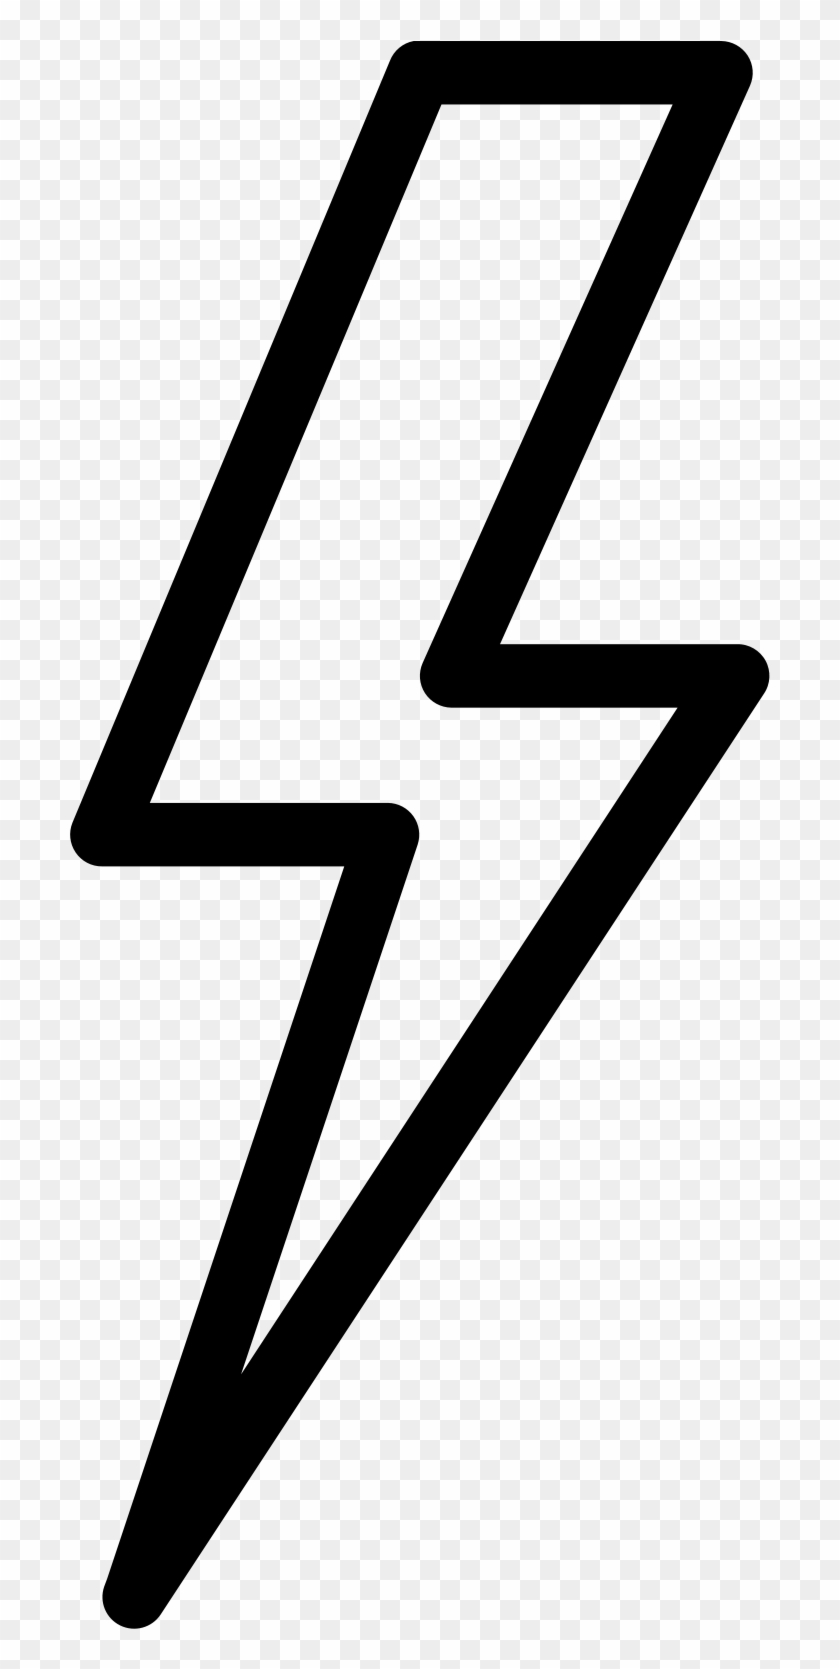 Lightning Bolt - Lightning Bolt Png #64818